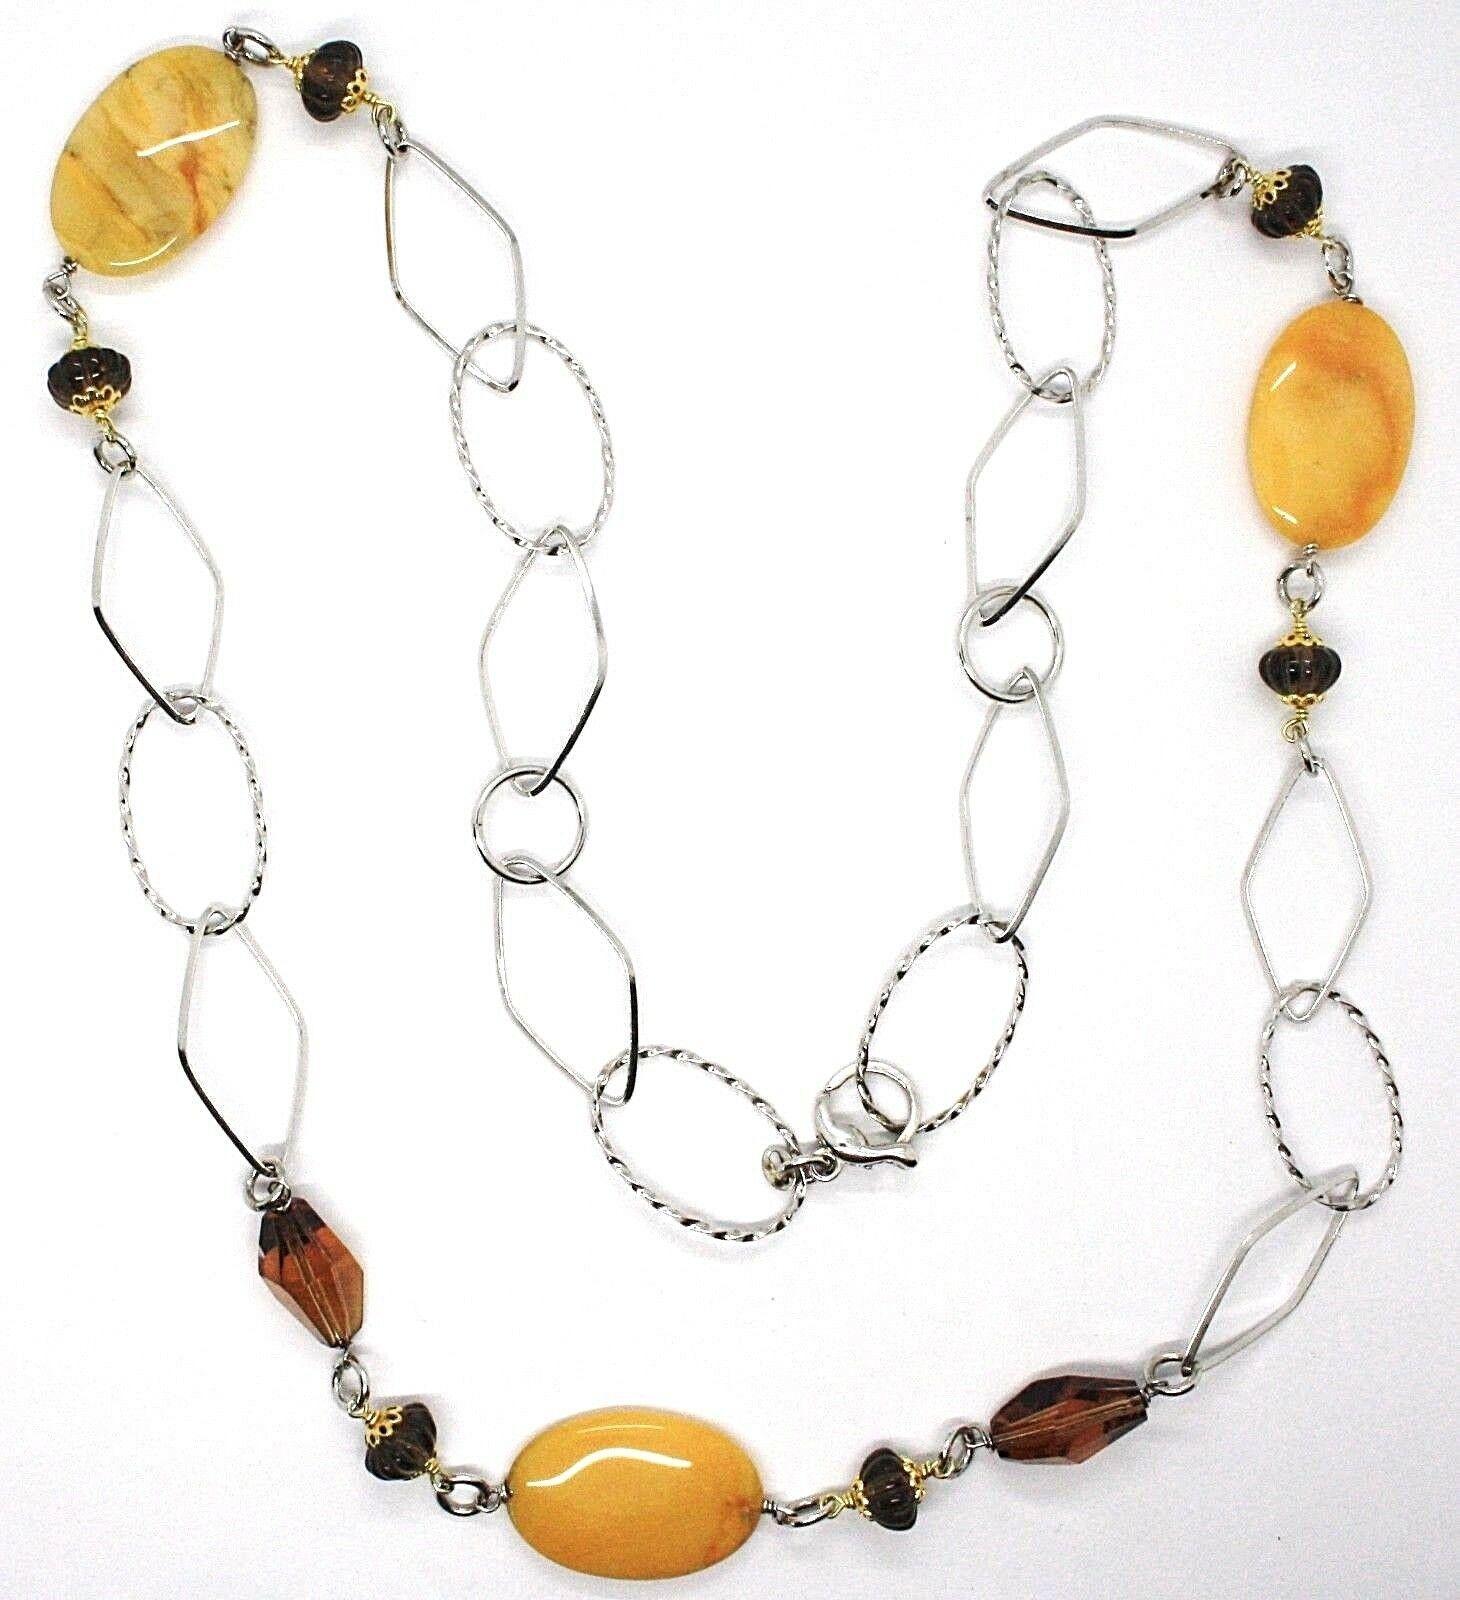 Halskette Silber 925, Jade Brown Oval, Quarz Rauchglas, Lang 80 CM